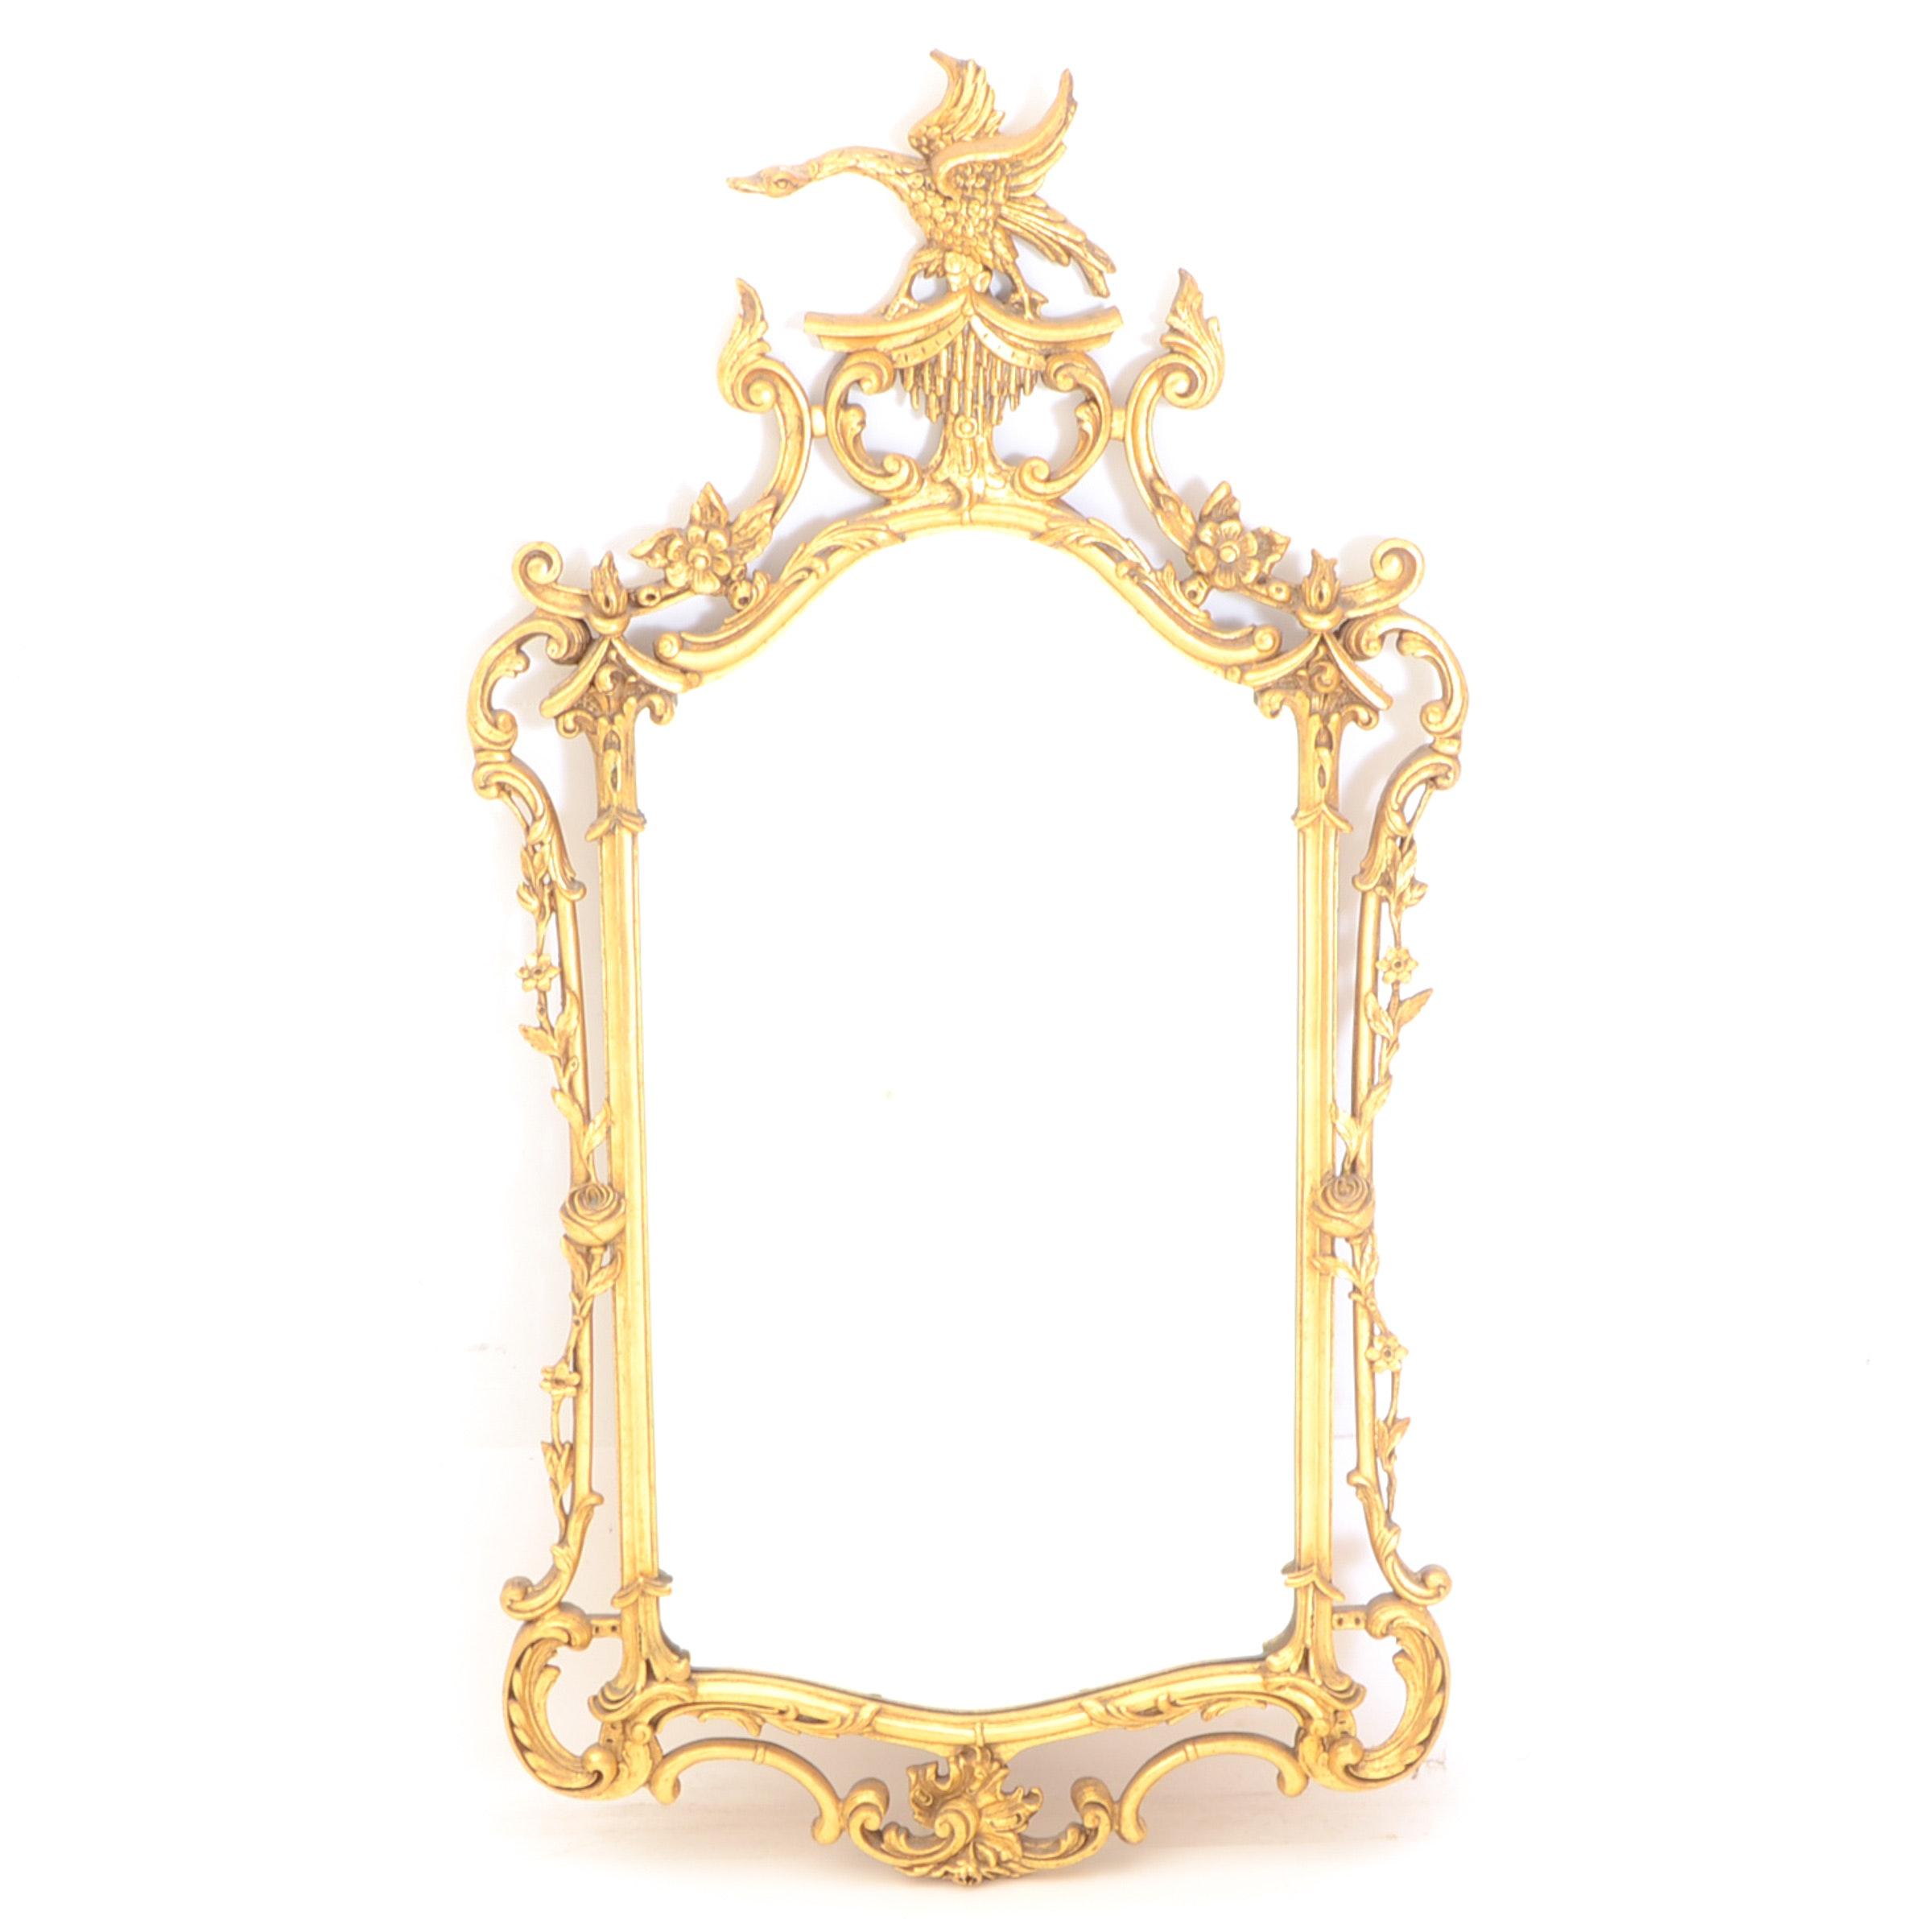 Rococo-Style Gilt Wall Mirror